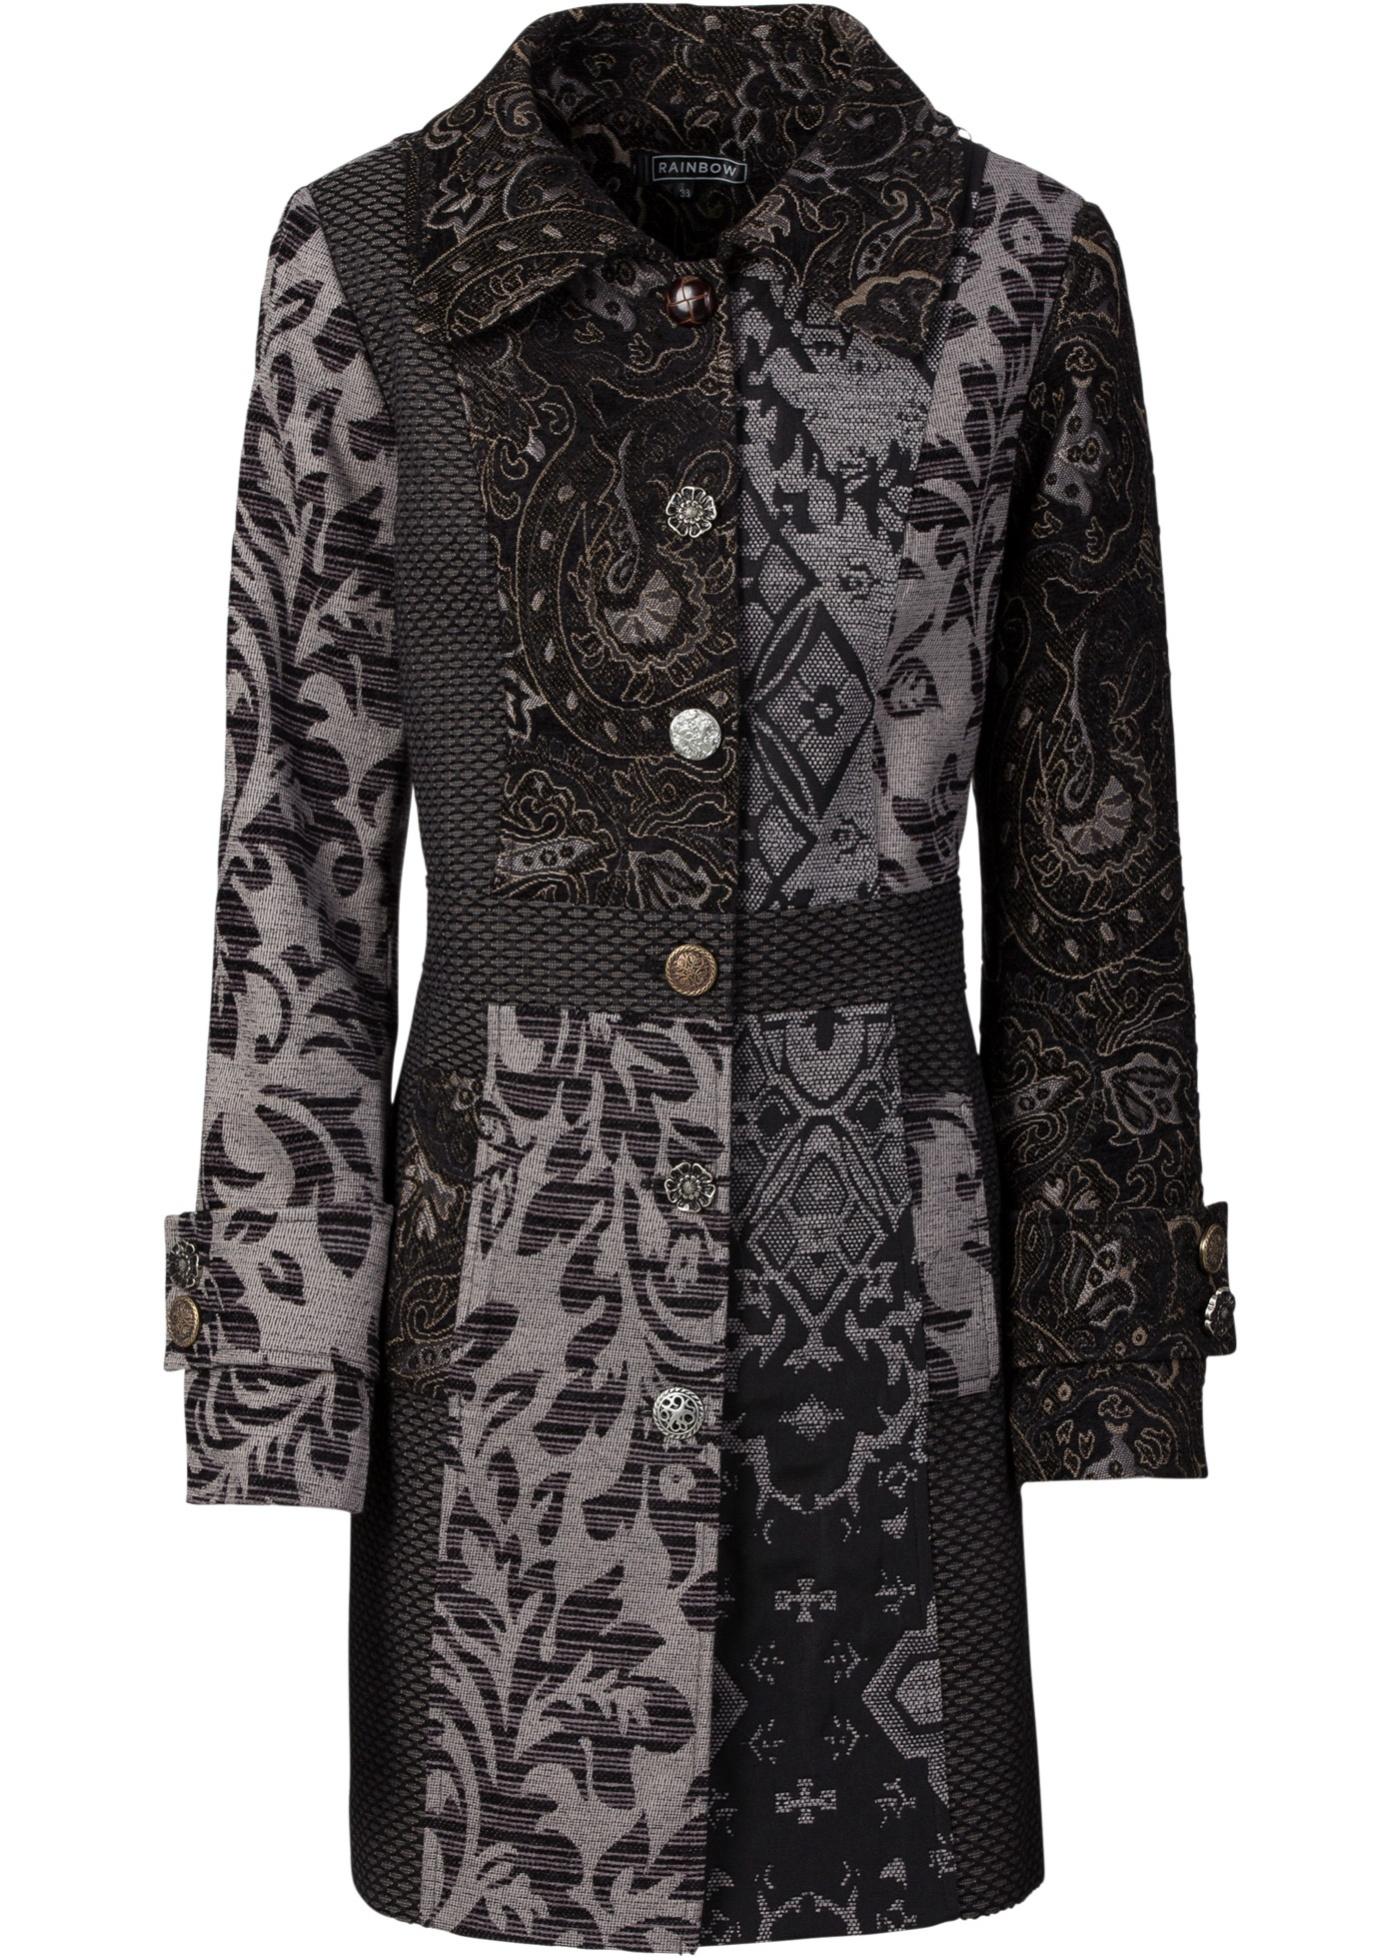 Manteau en jacquard mode